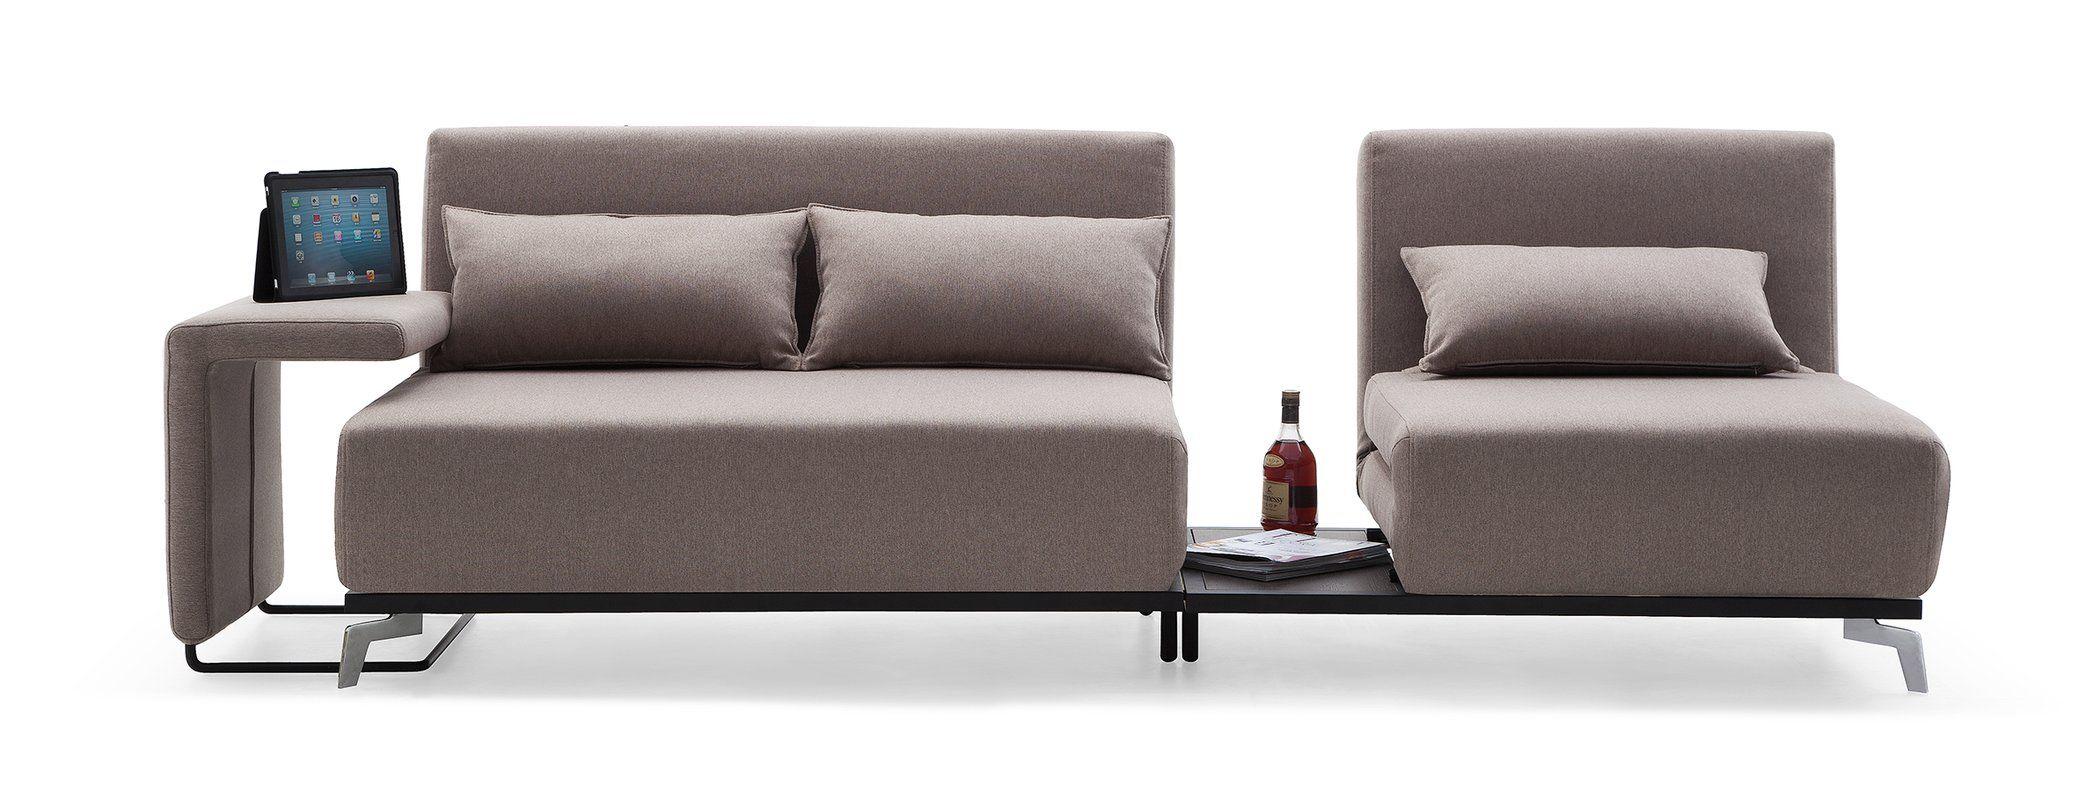 Demelo convertible sofa apartment furniture ideas pinterest house